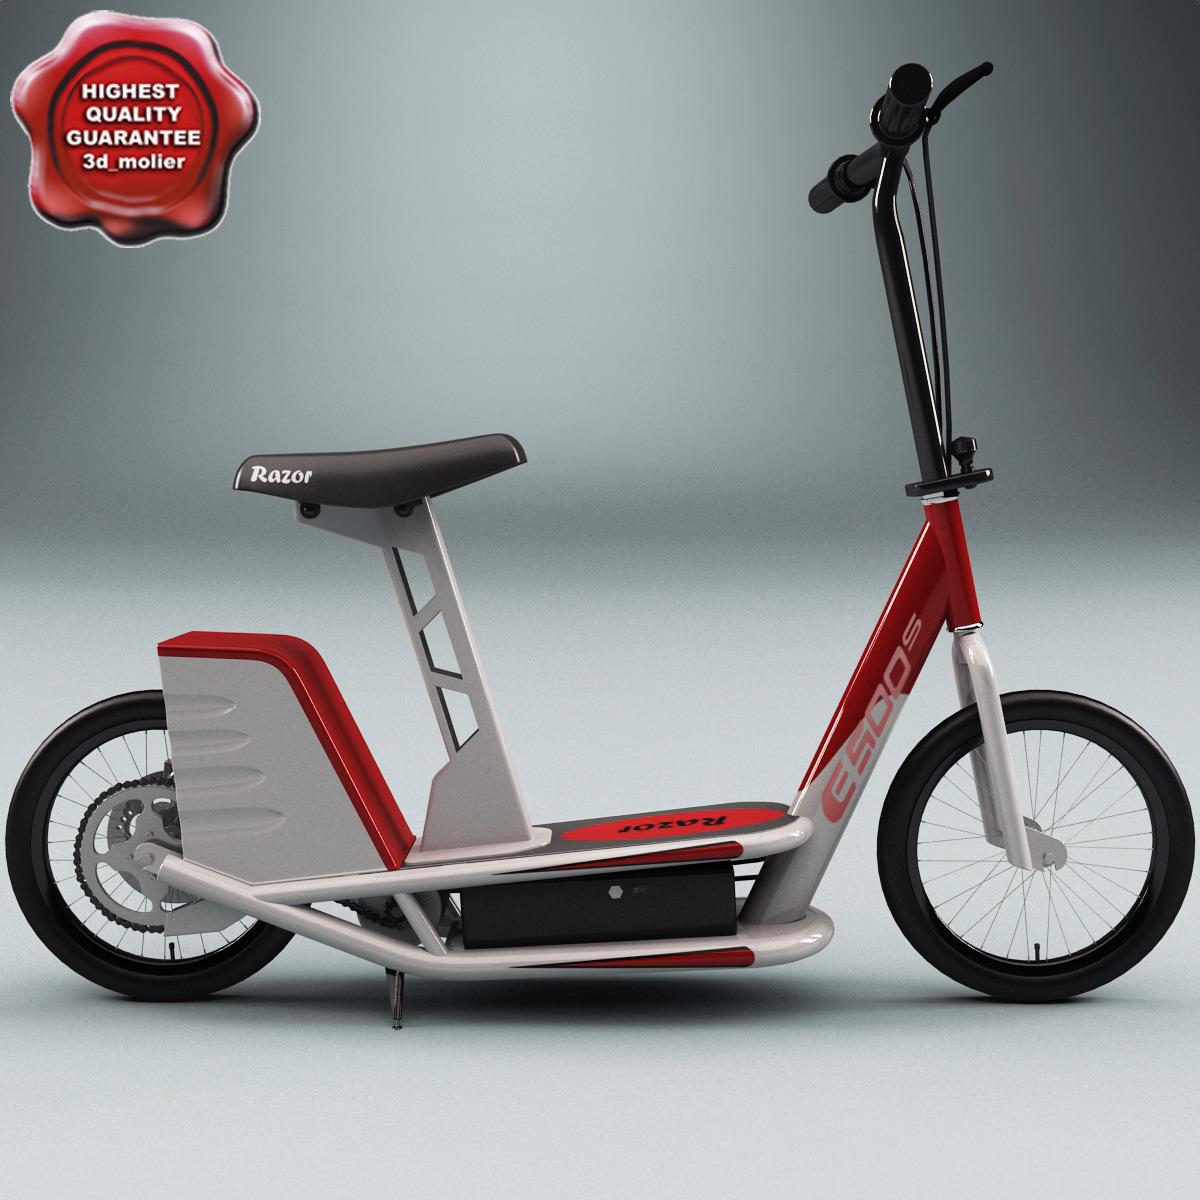 Razor_Electric_Scooter_E500S_00.jpg